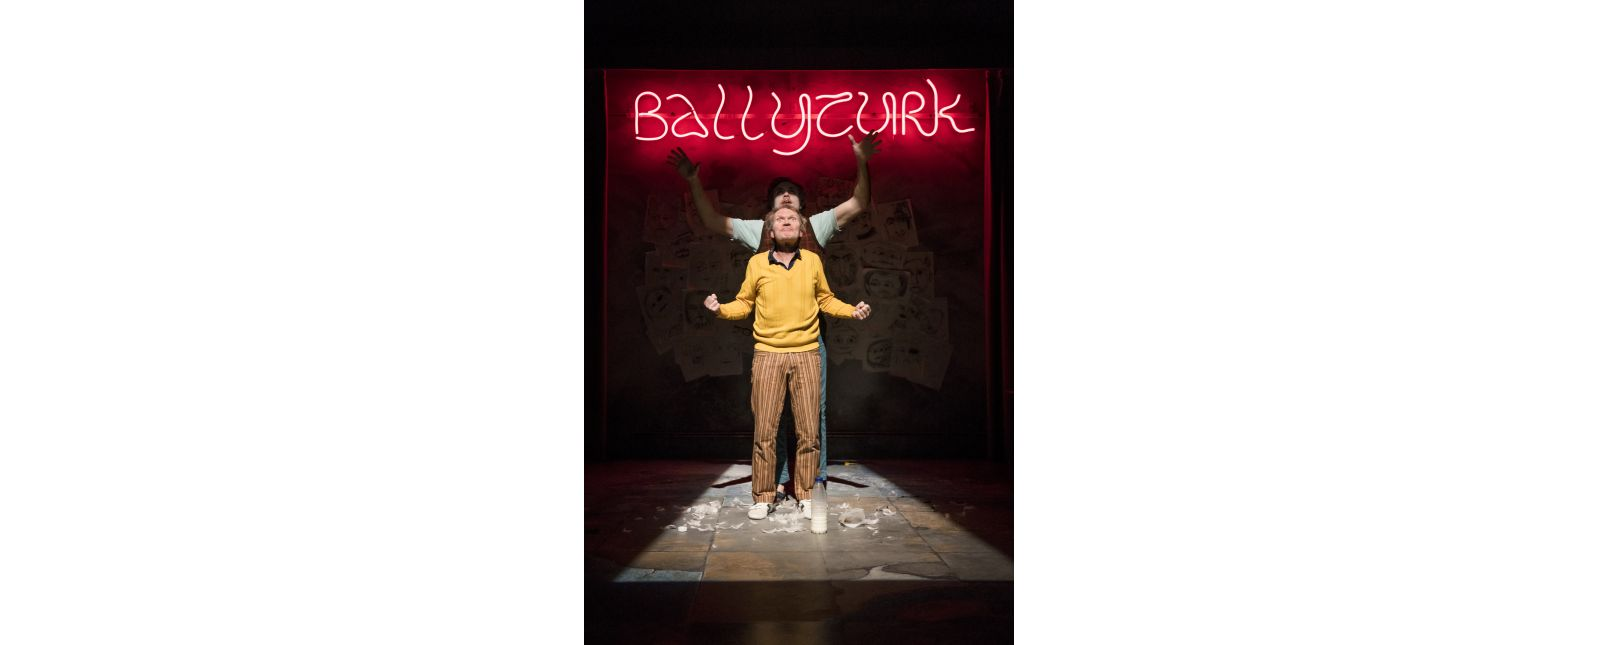 Ballyturk // Michael Witte // Lukas T. Sperber // 2019 // Marc Doradzillo